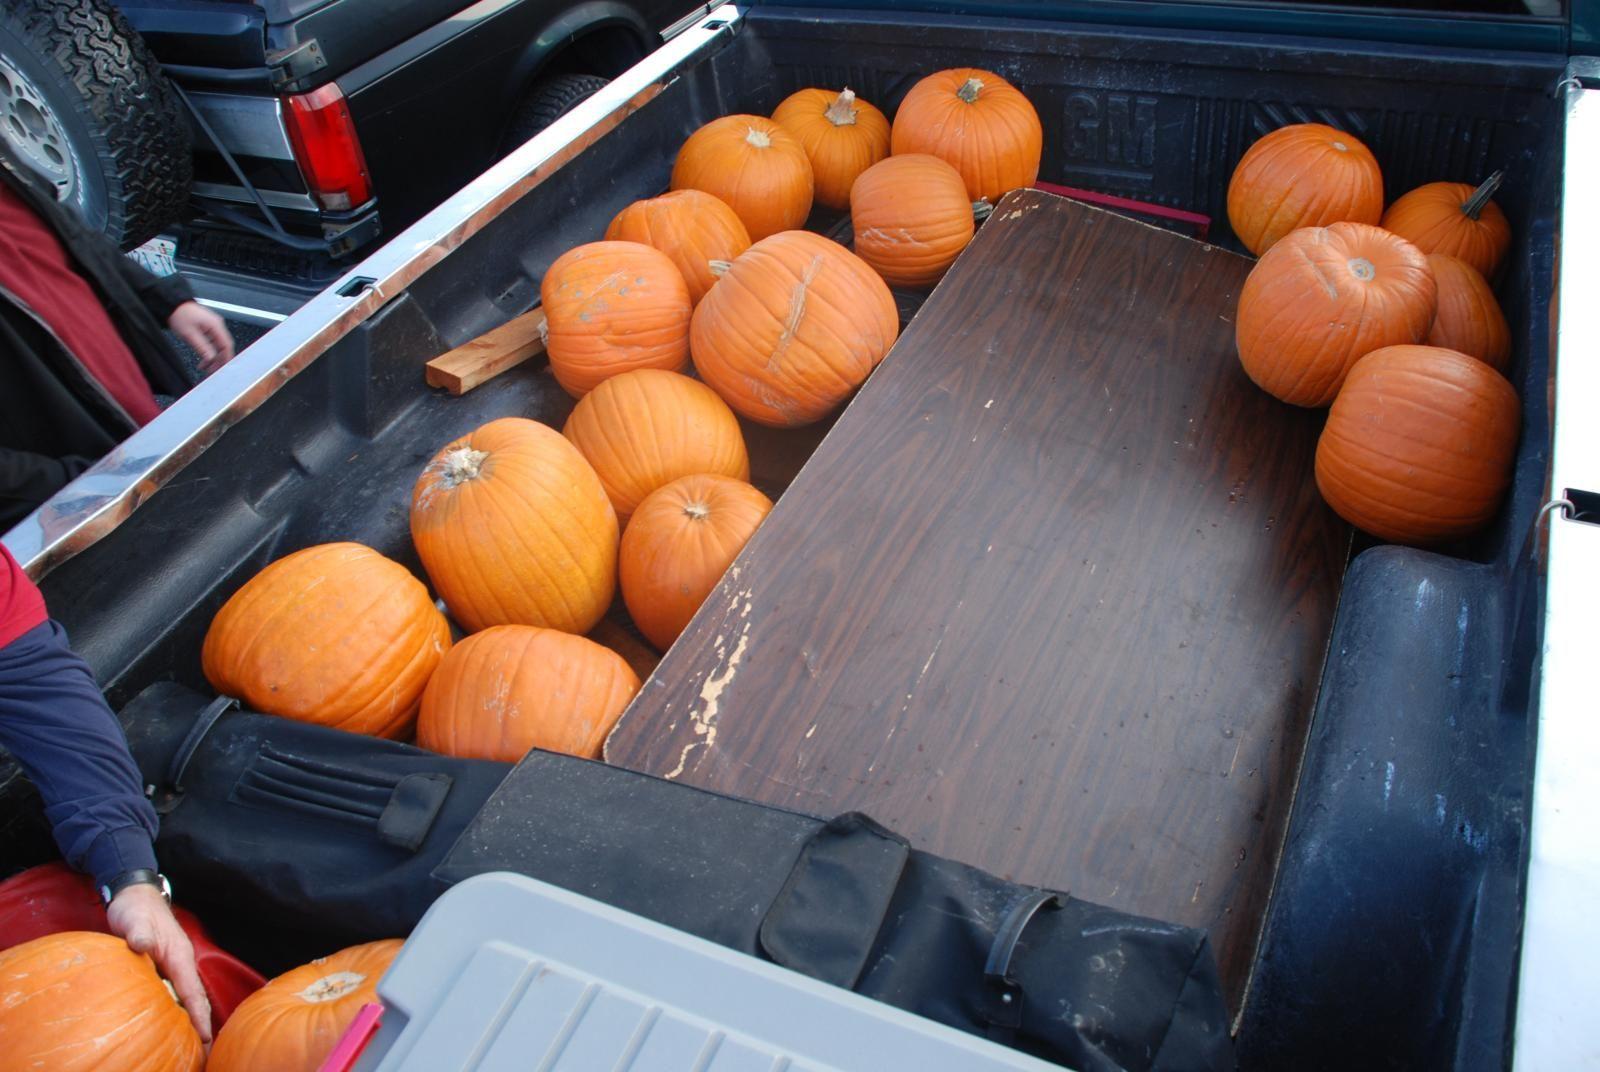 Pumpkins being delivered to event